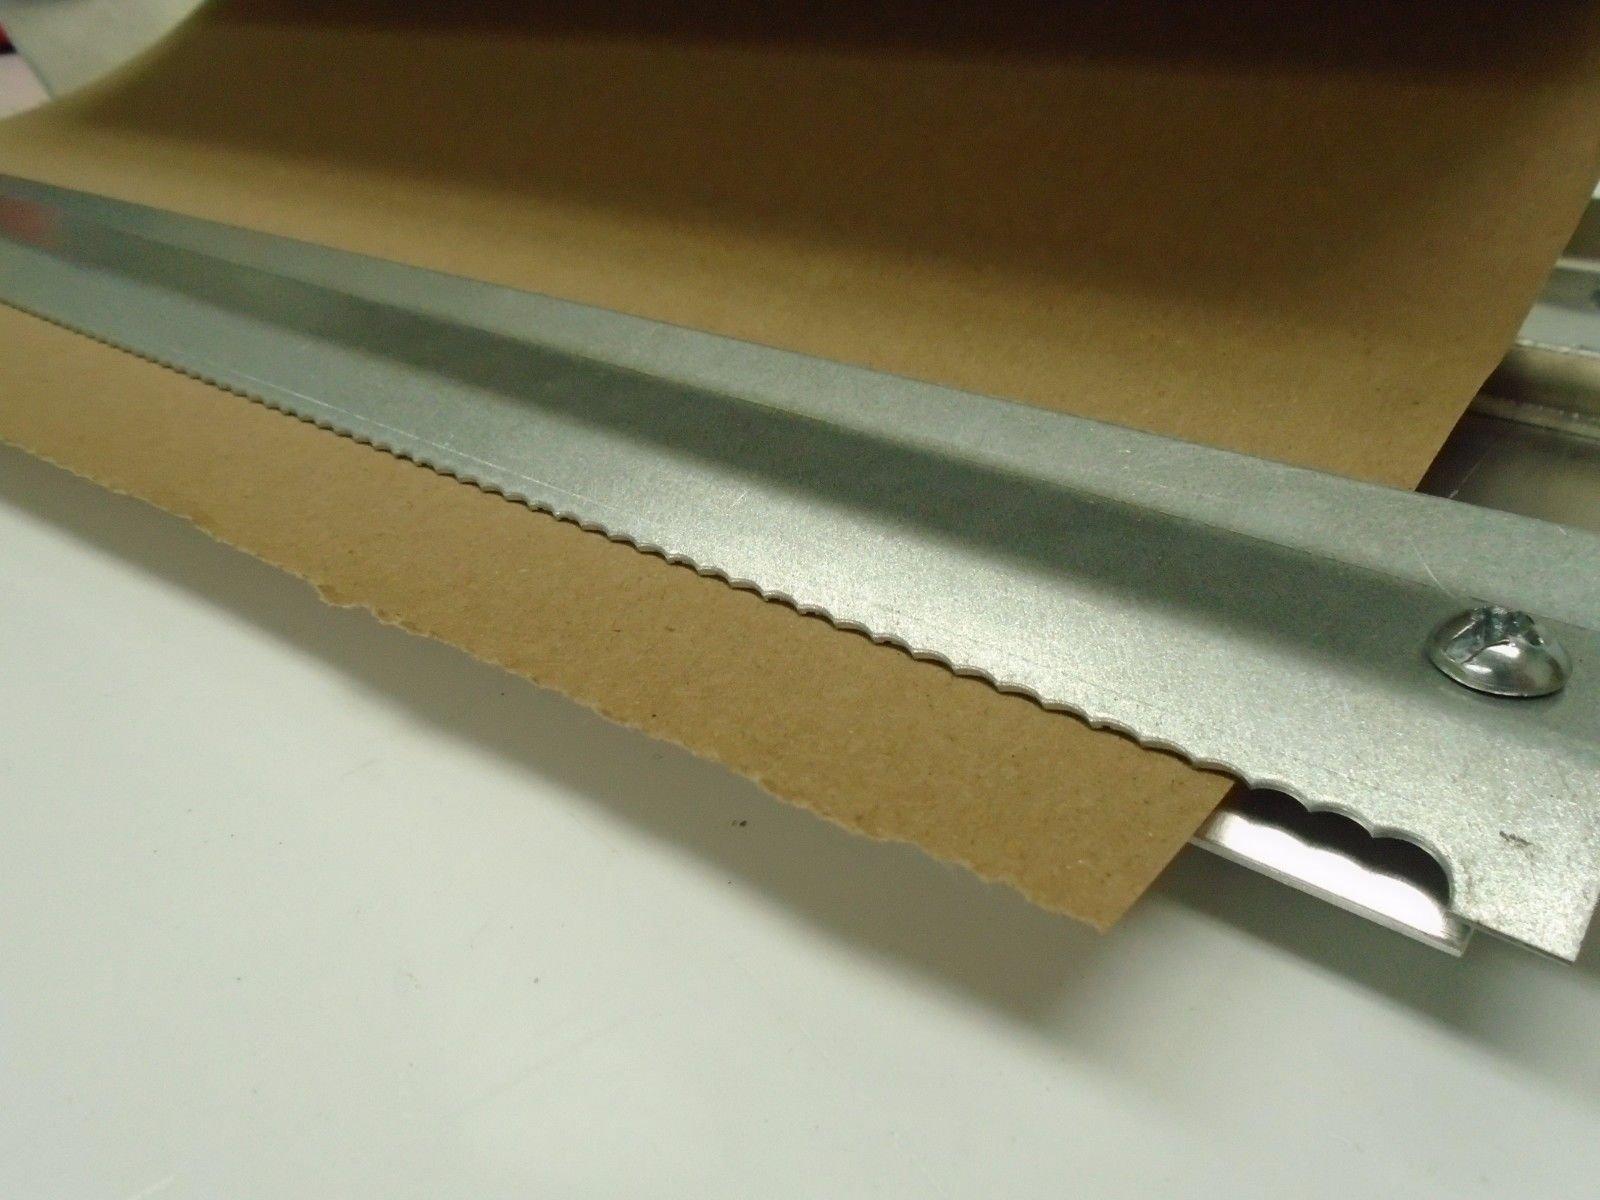 Paper Cutter Roll Dispenser Econoline 18 inches table mount Kraft paper Duralov by Duralov (Image #2)